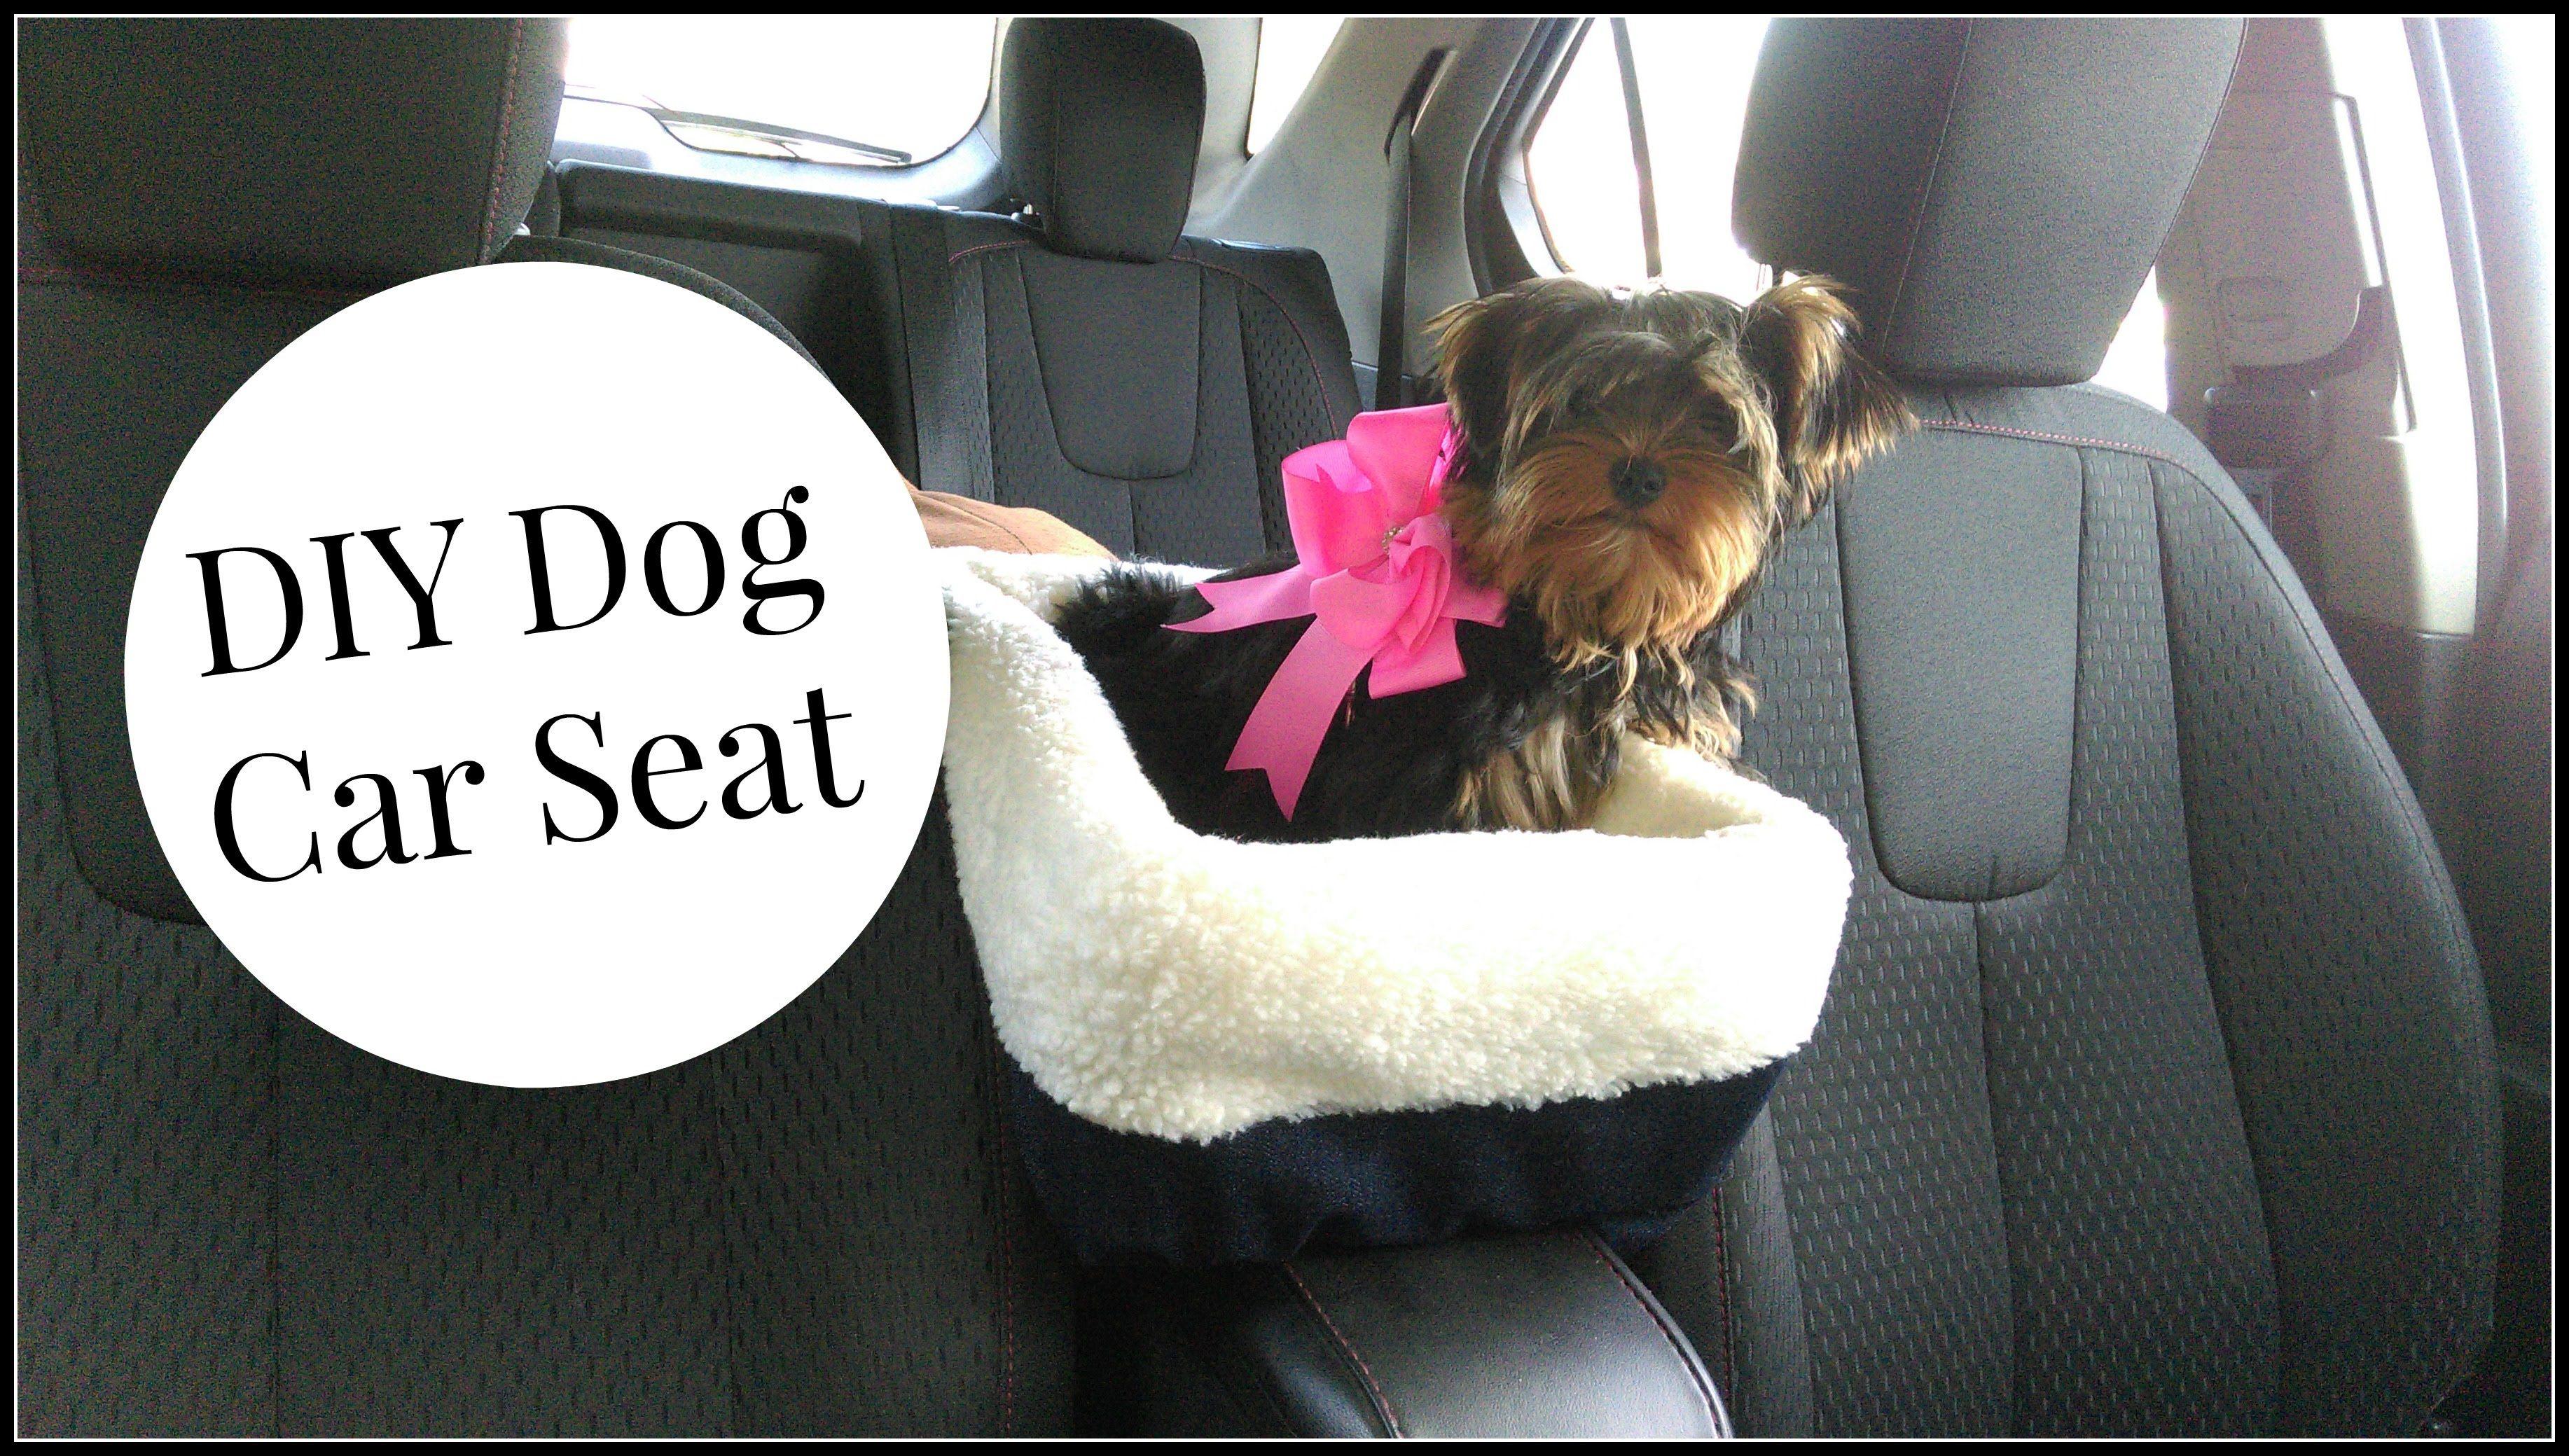 Diy Dog Car Seat Tutorial Diy Dog Stuff Dog Car Seats Dog Car